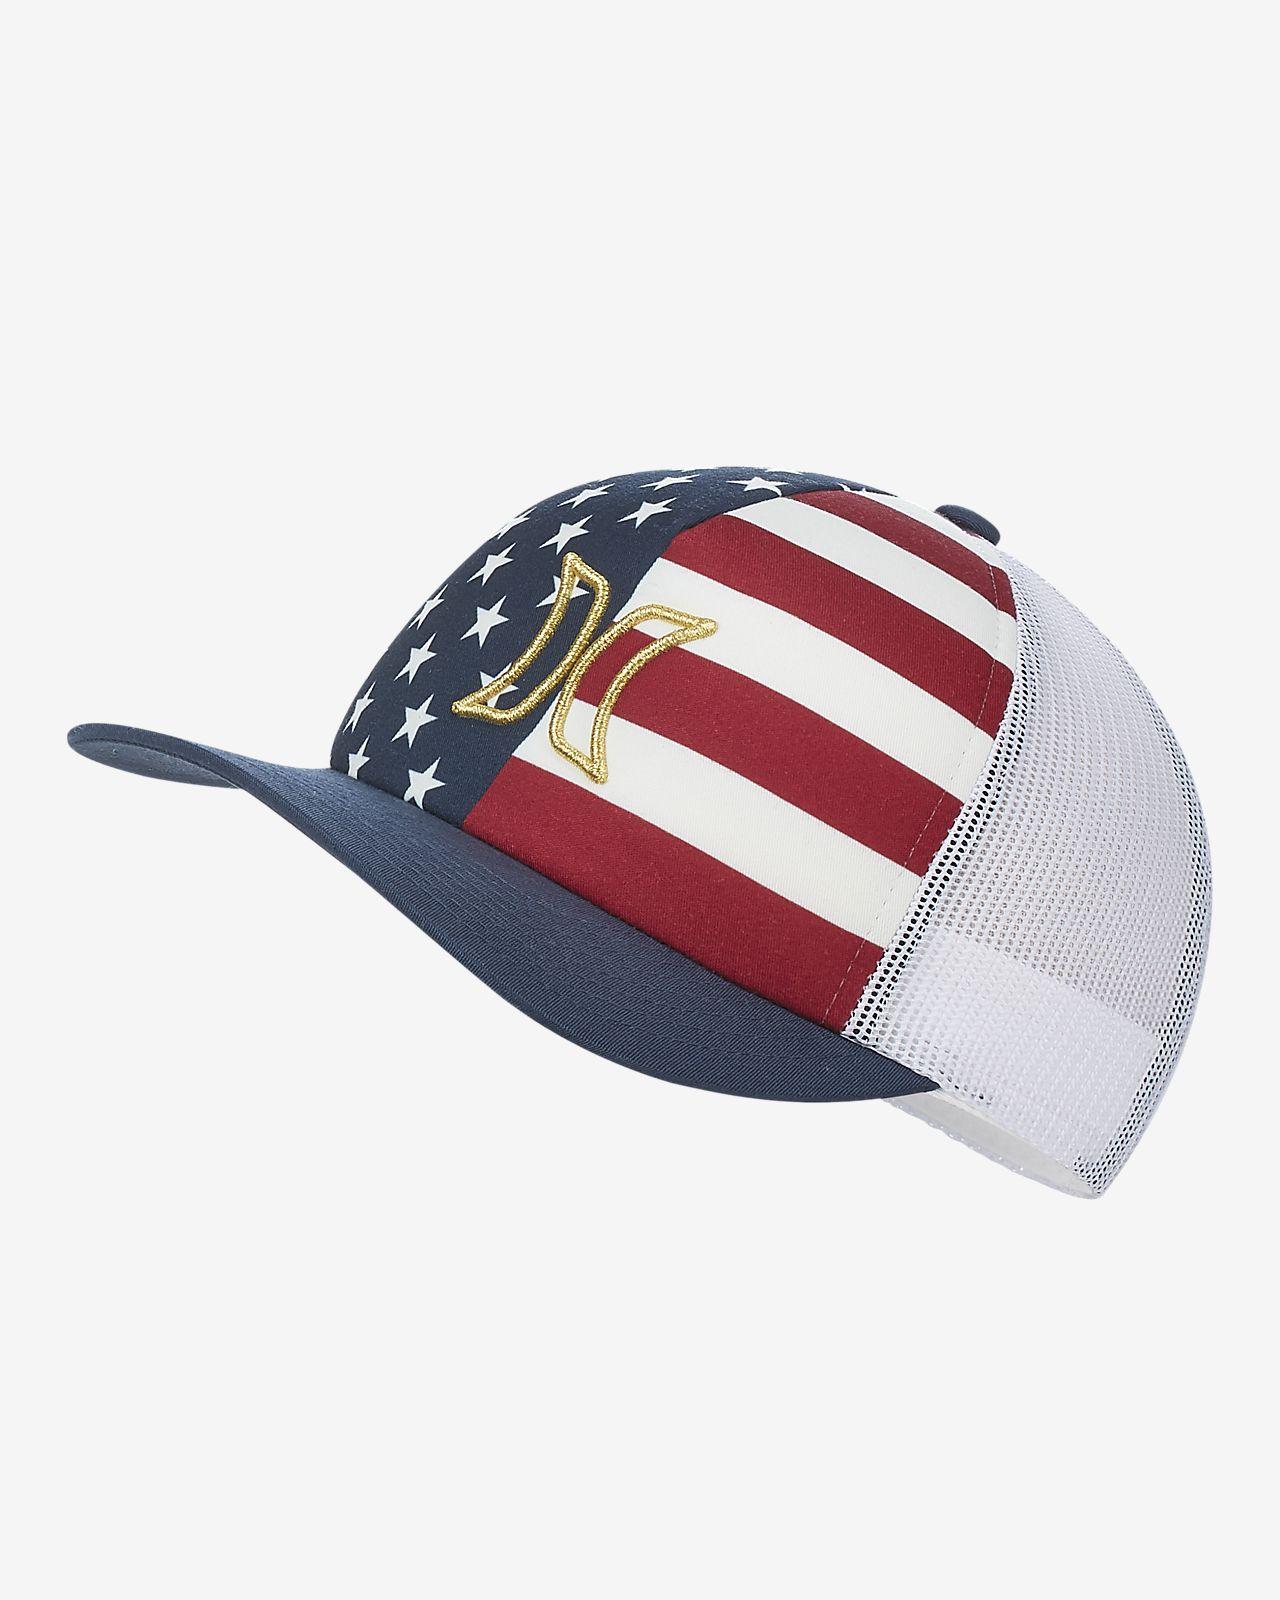 Hurley USA Women's Trucker Hat